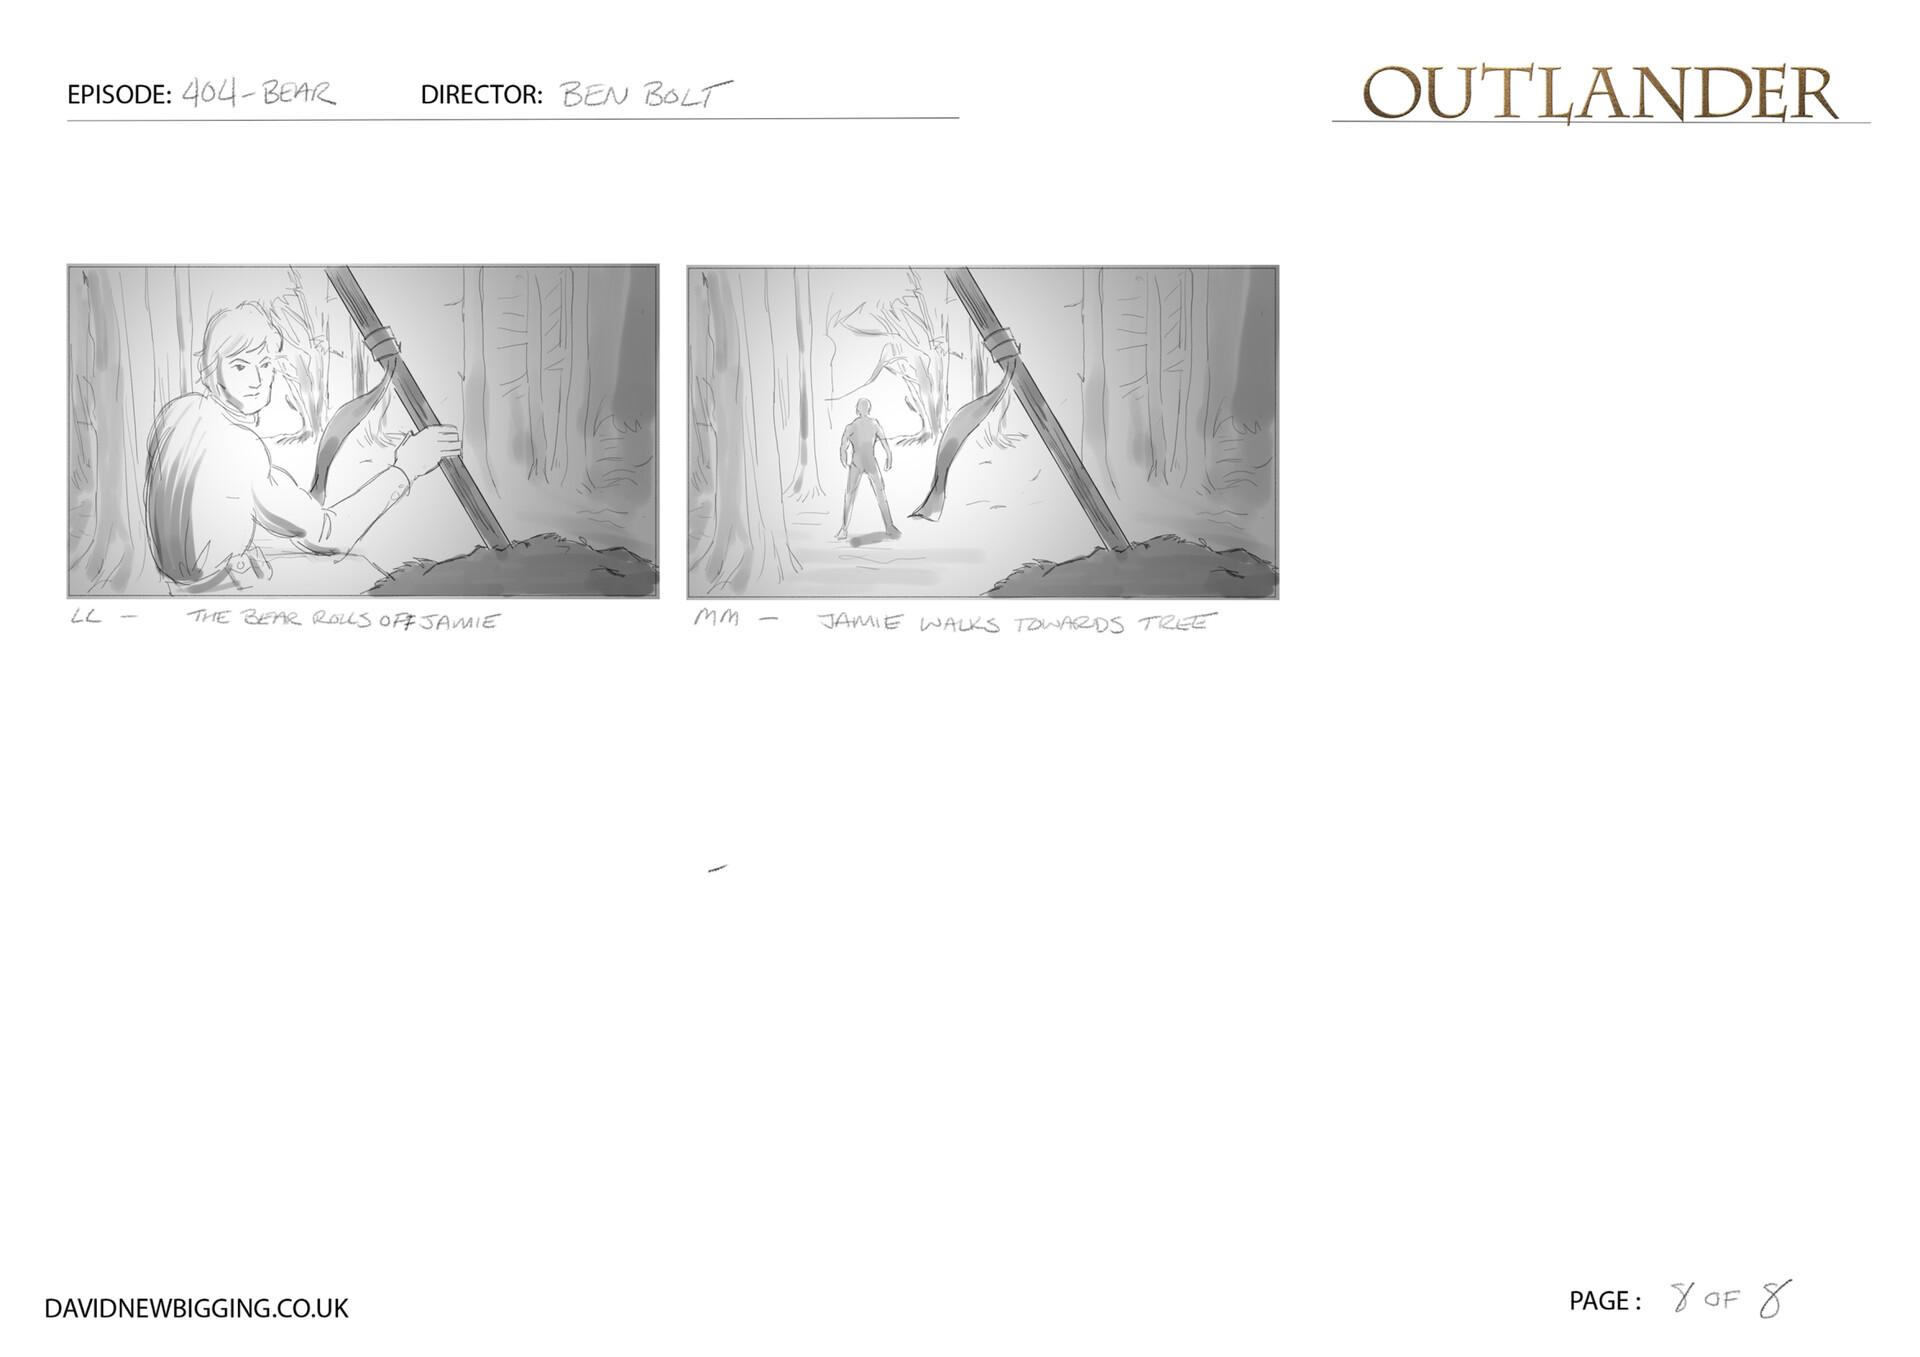 David newbigging outlander 404 bear sequence storyboards 8